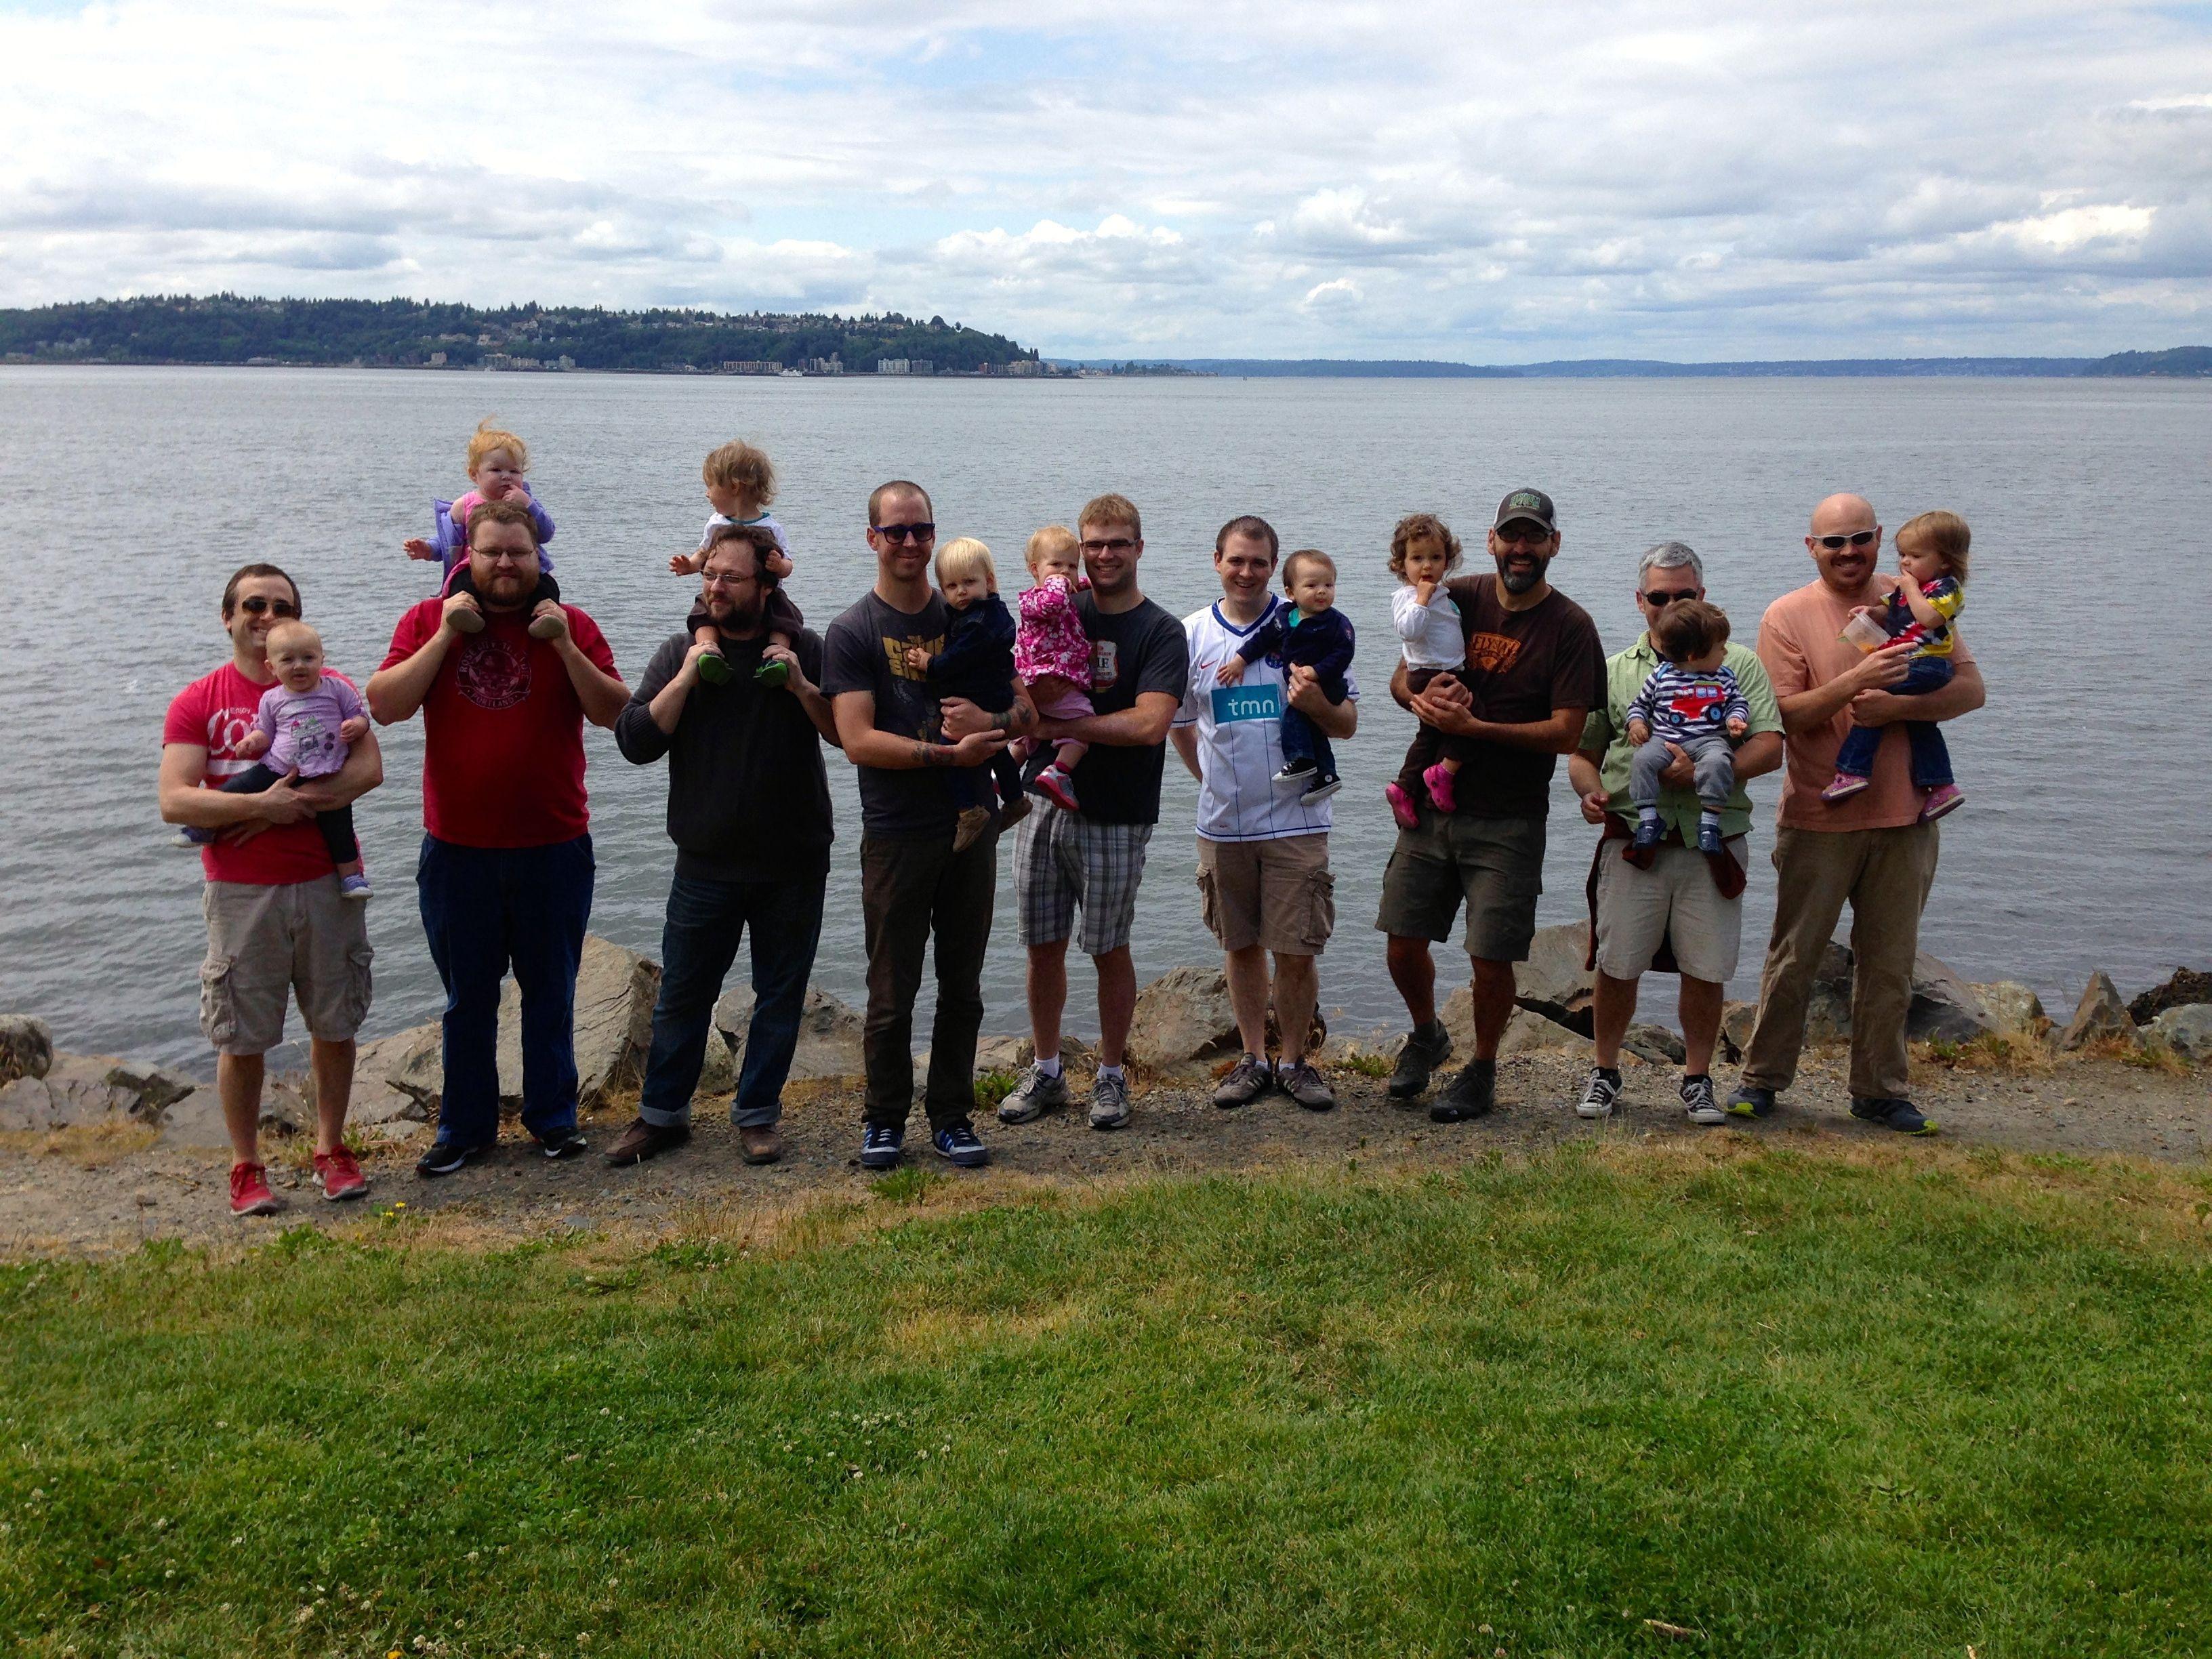 Puget Sound Dads Group